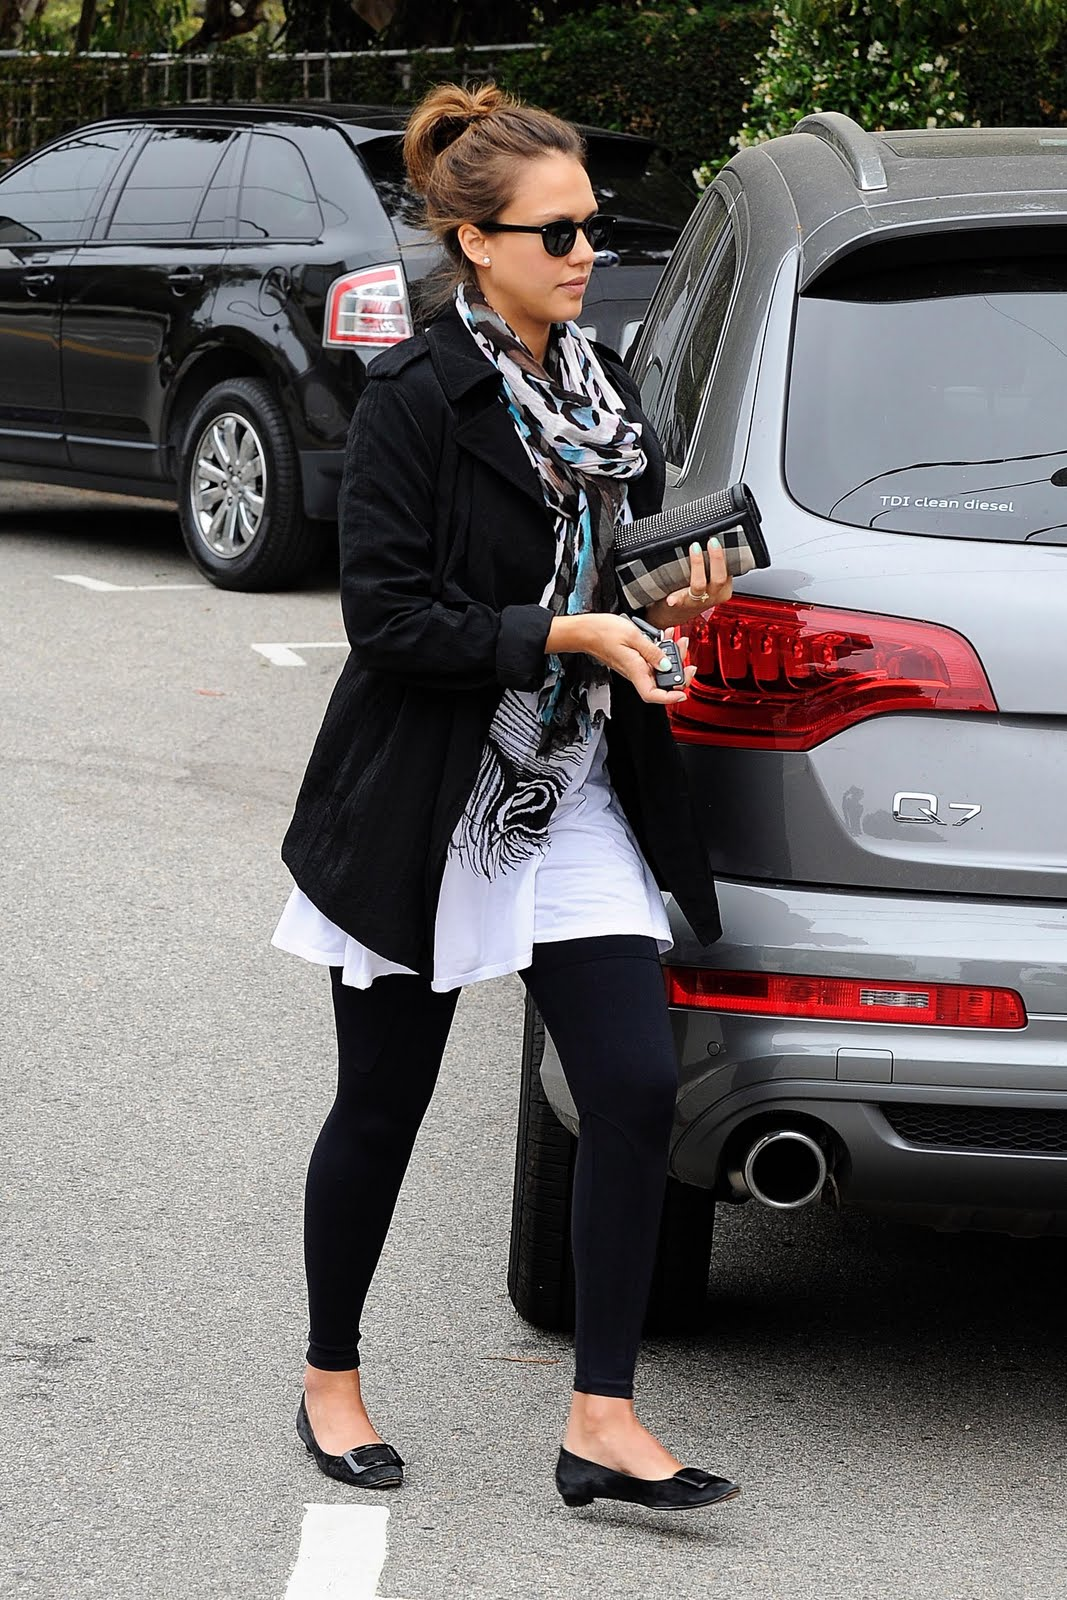 http://1.bp.blogspot.com/-R9G7poiuvBk/Tfufzqmev-I/AAAAAAAAHC8/W_4ClA_RvRQ/s1600/jessica-alba-pregnant-celebrity-mom-fashion-4.jpg